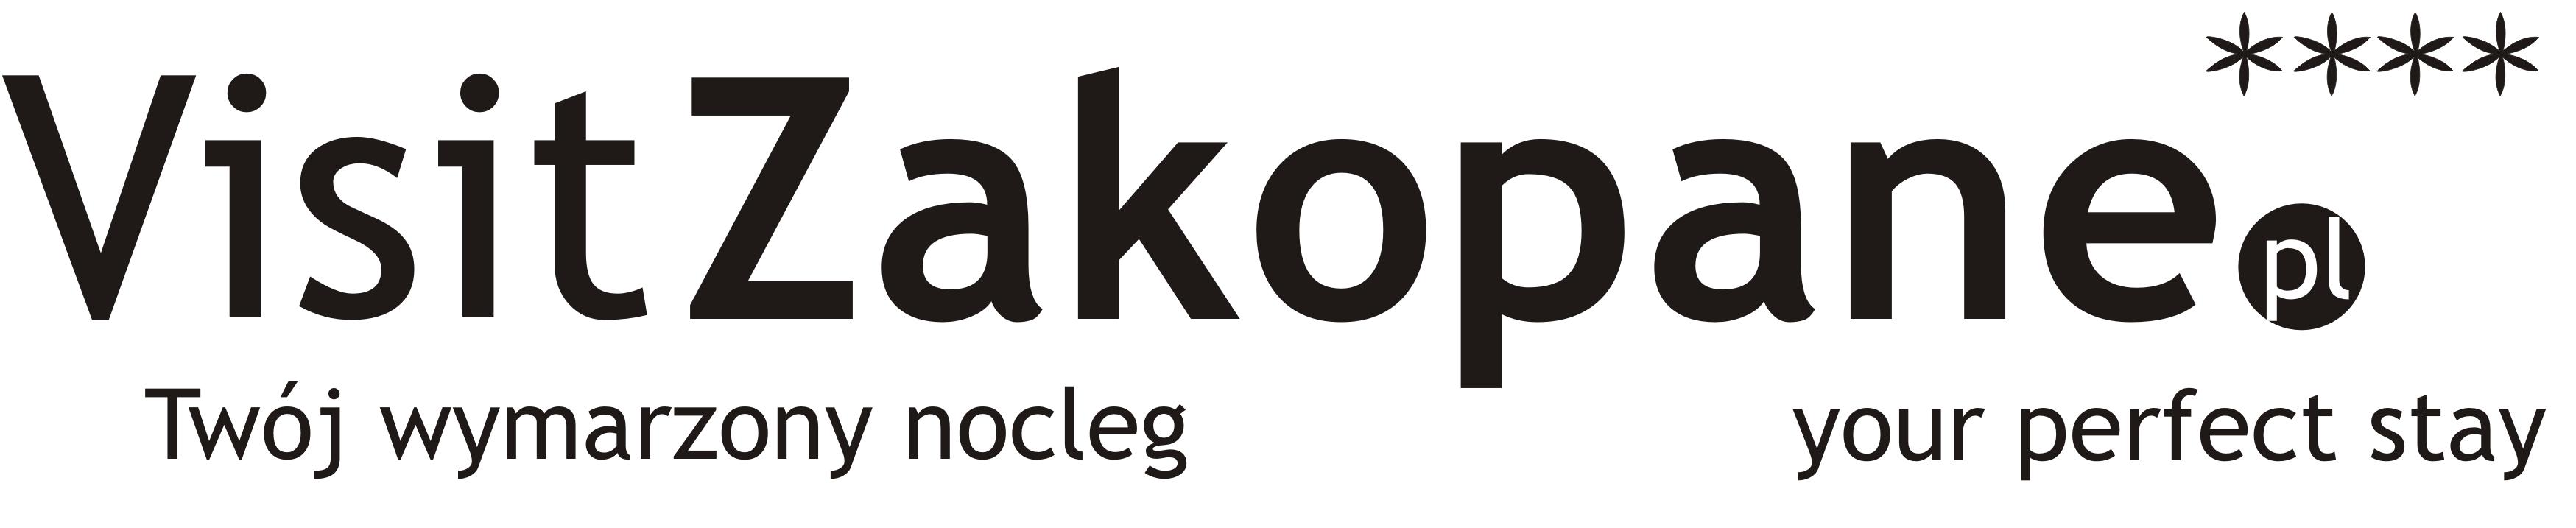 Blog - Apartamenty VisitZakopane.pl